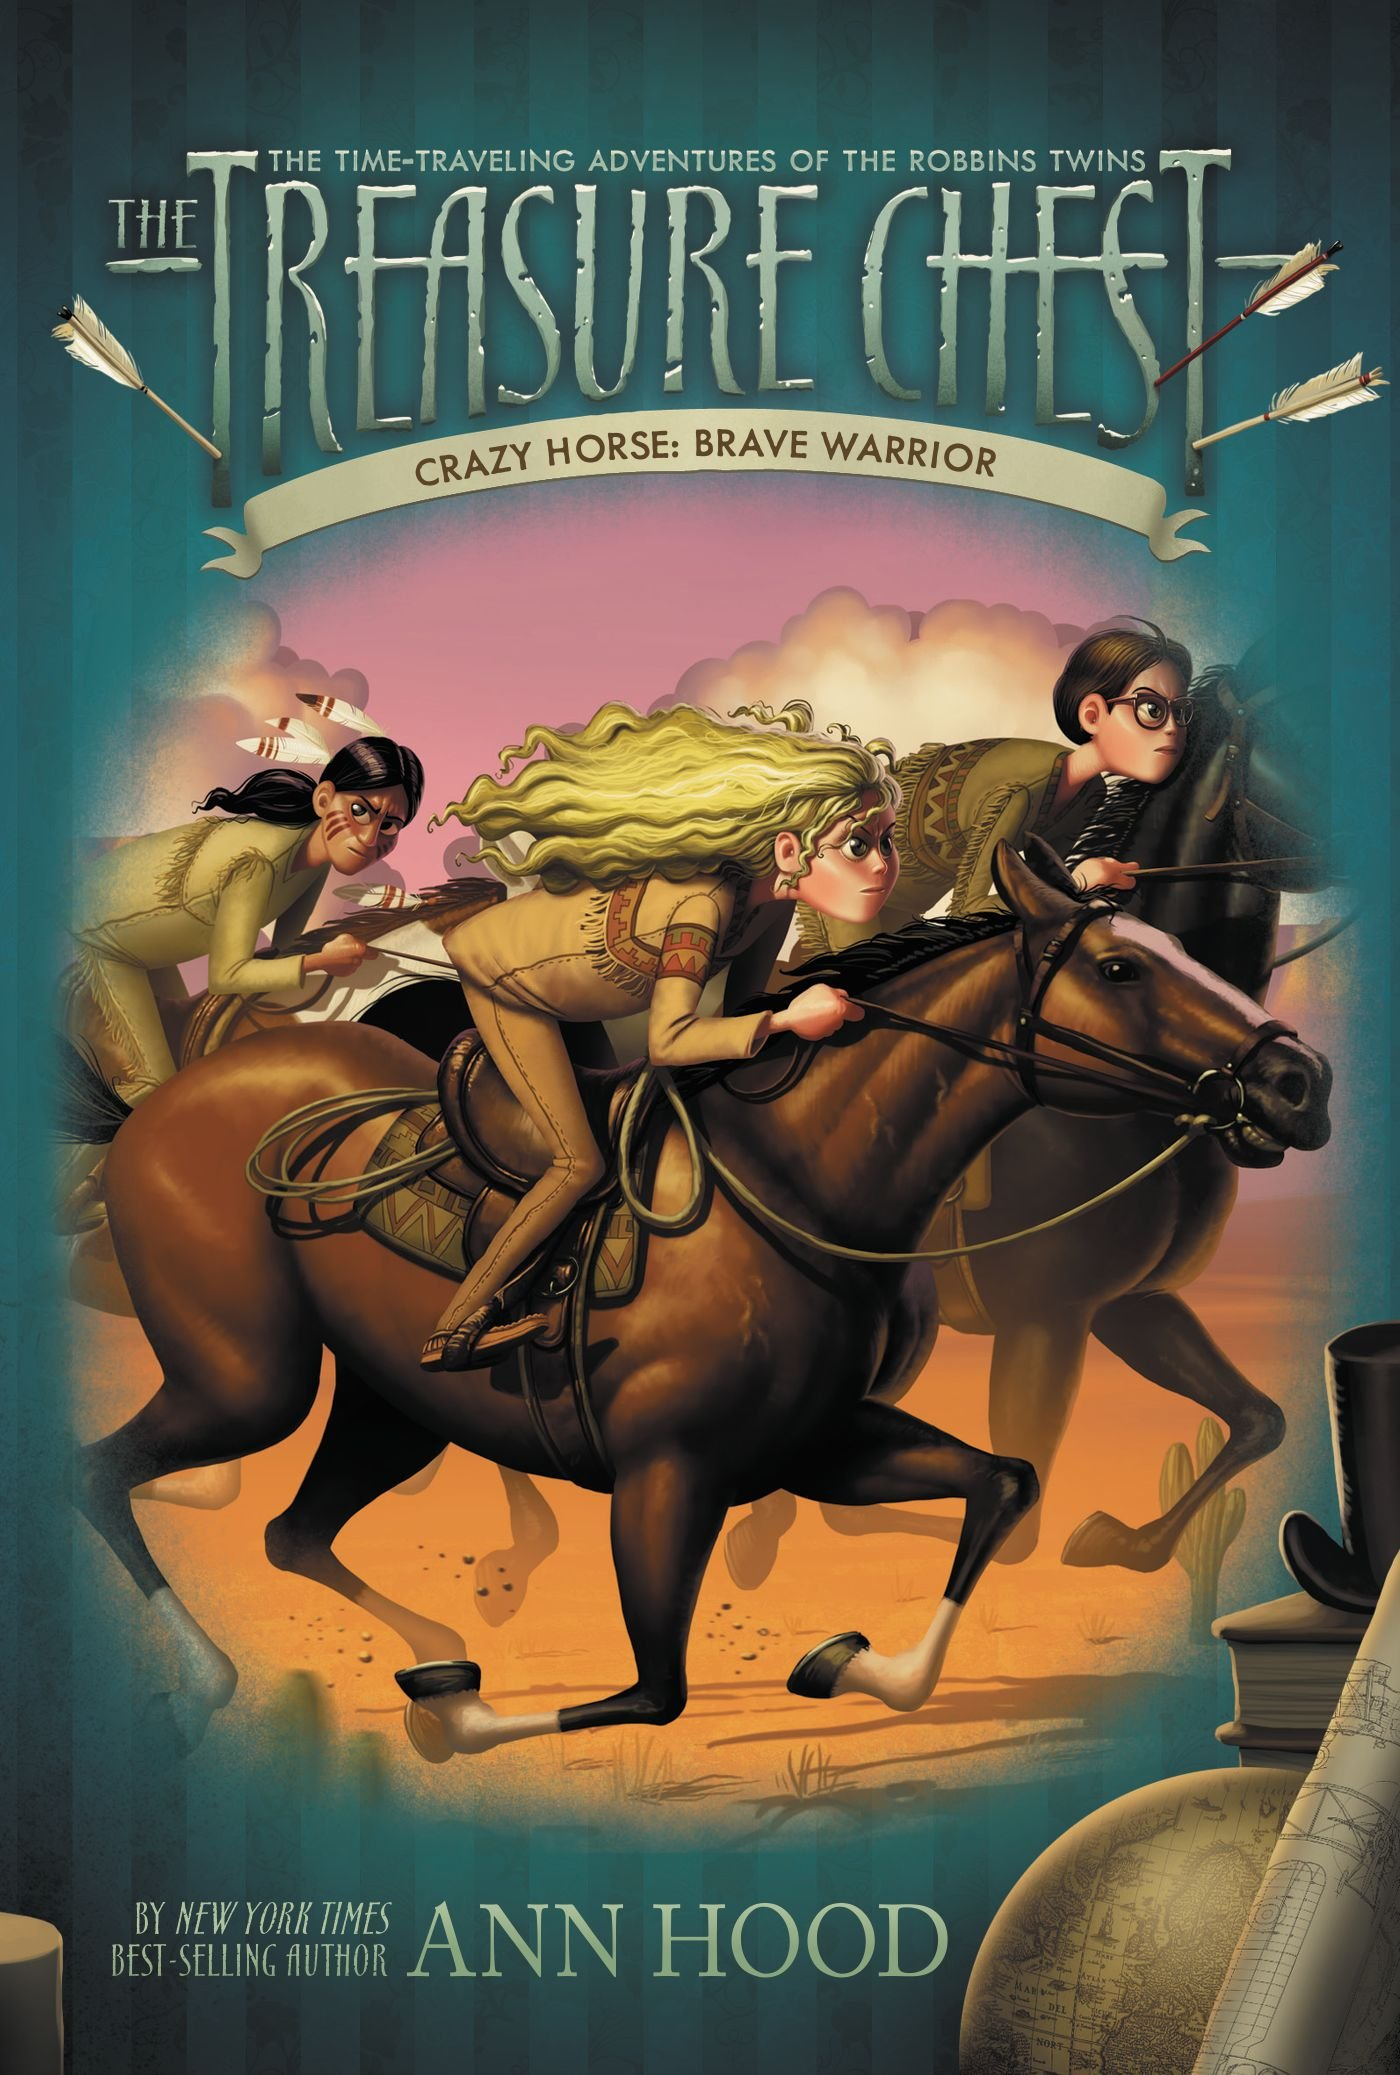 Download Crazy Horse #5: Brave Warrior (The Treasure Chest) ebook